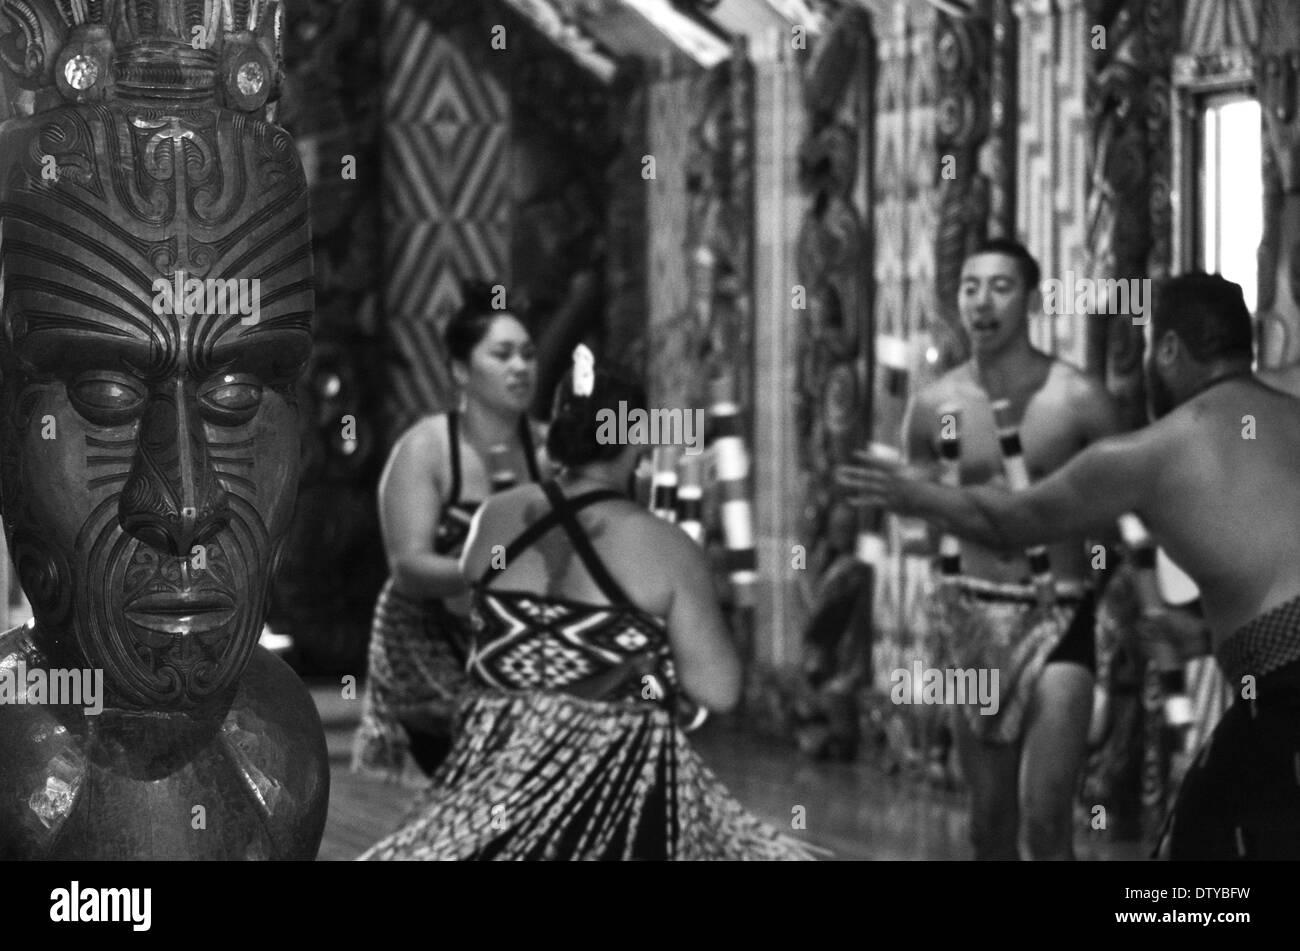 Maori people sing and dance during Waitangi Day in Waitangi, Northland, New Zealand (BW) - Stock Image